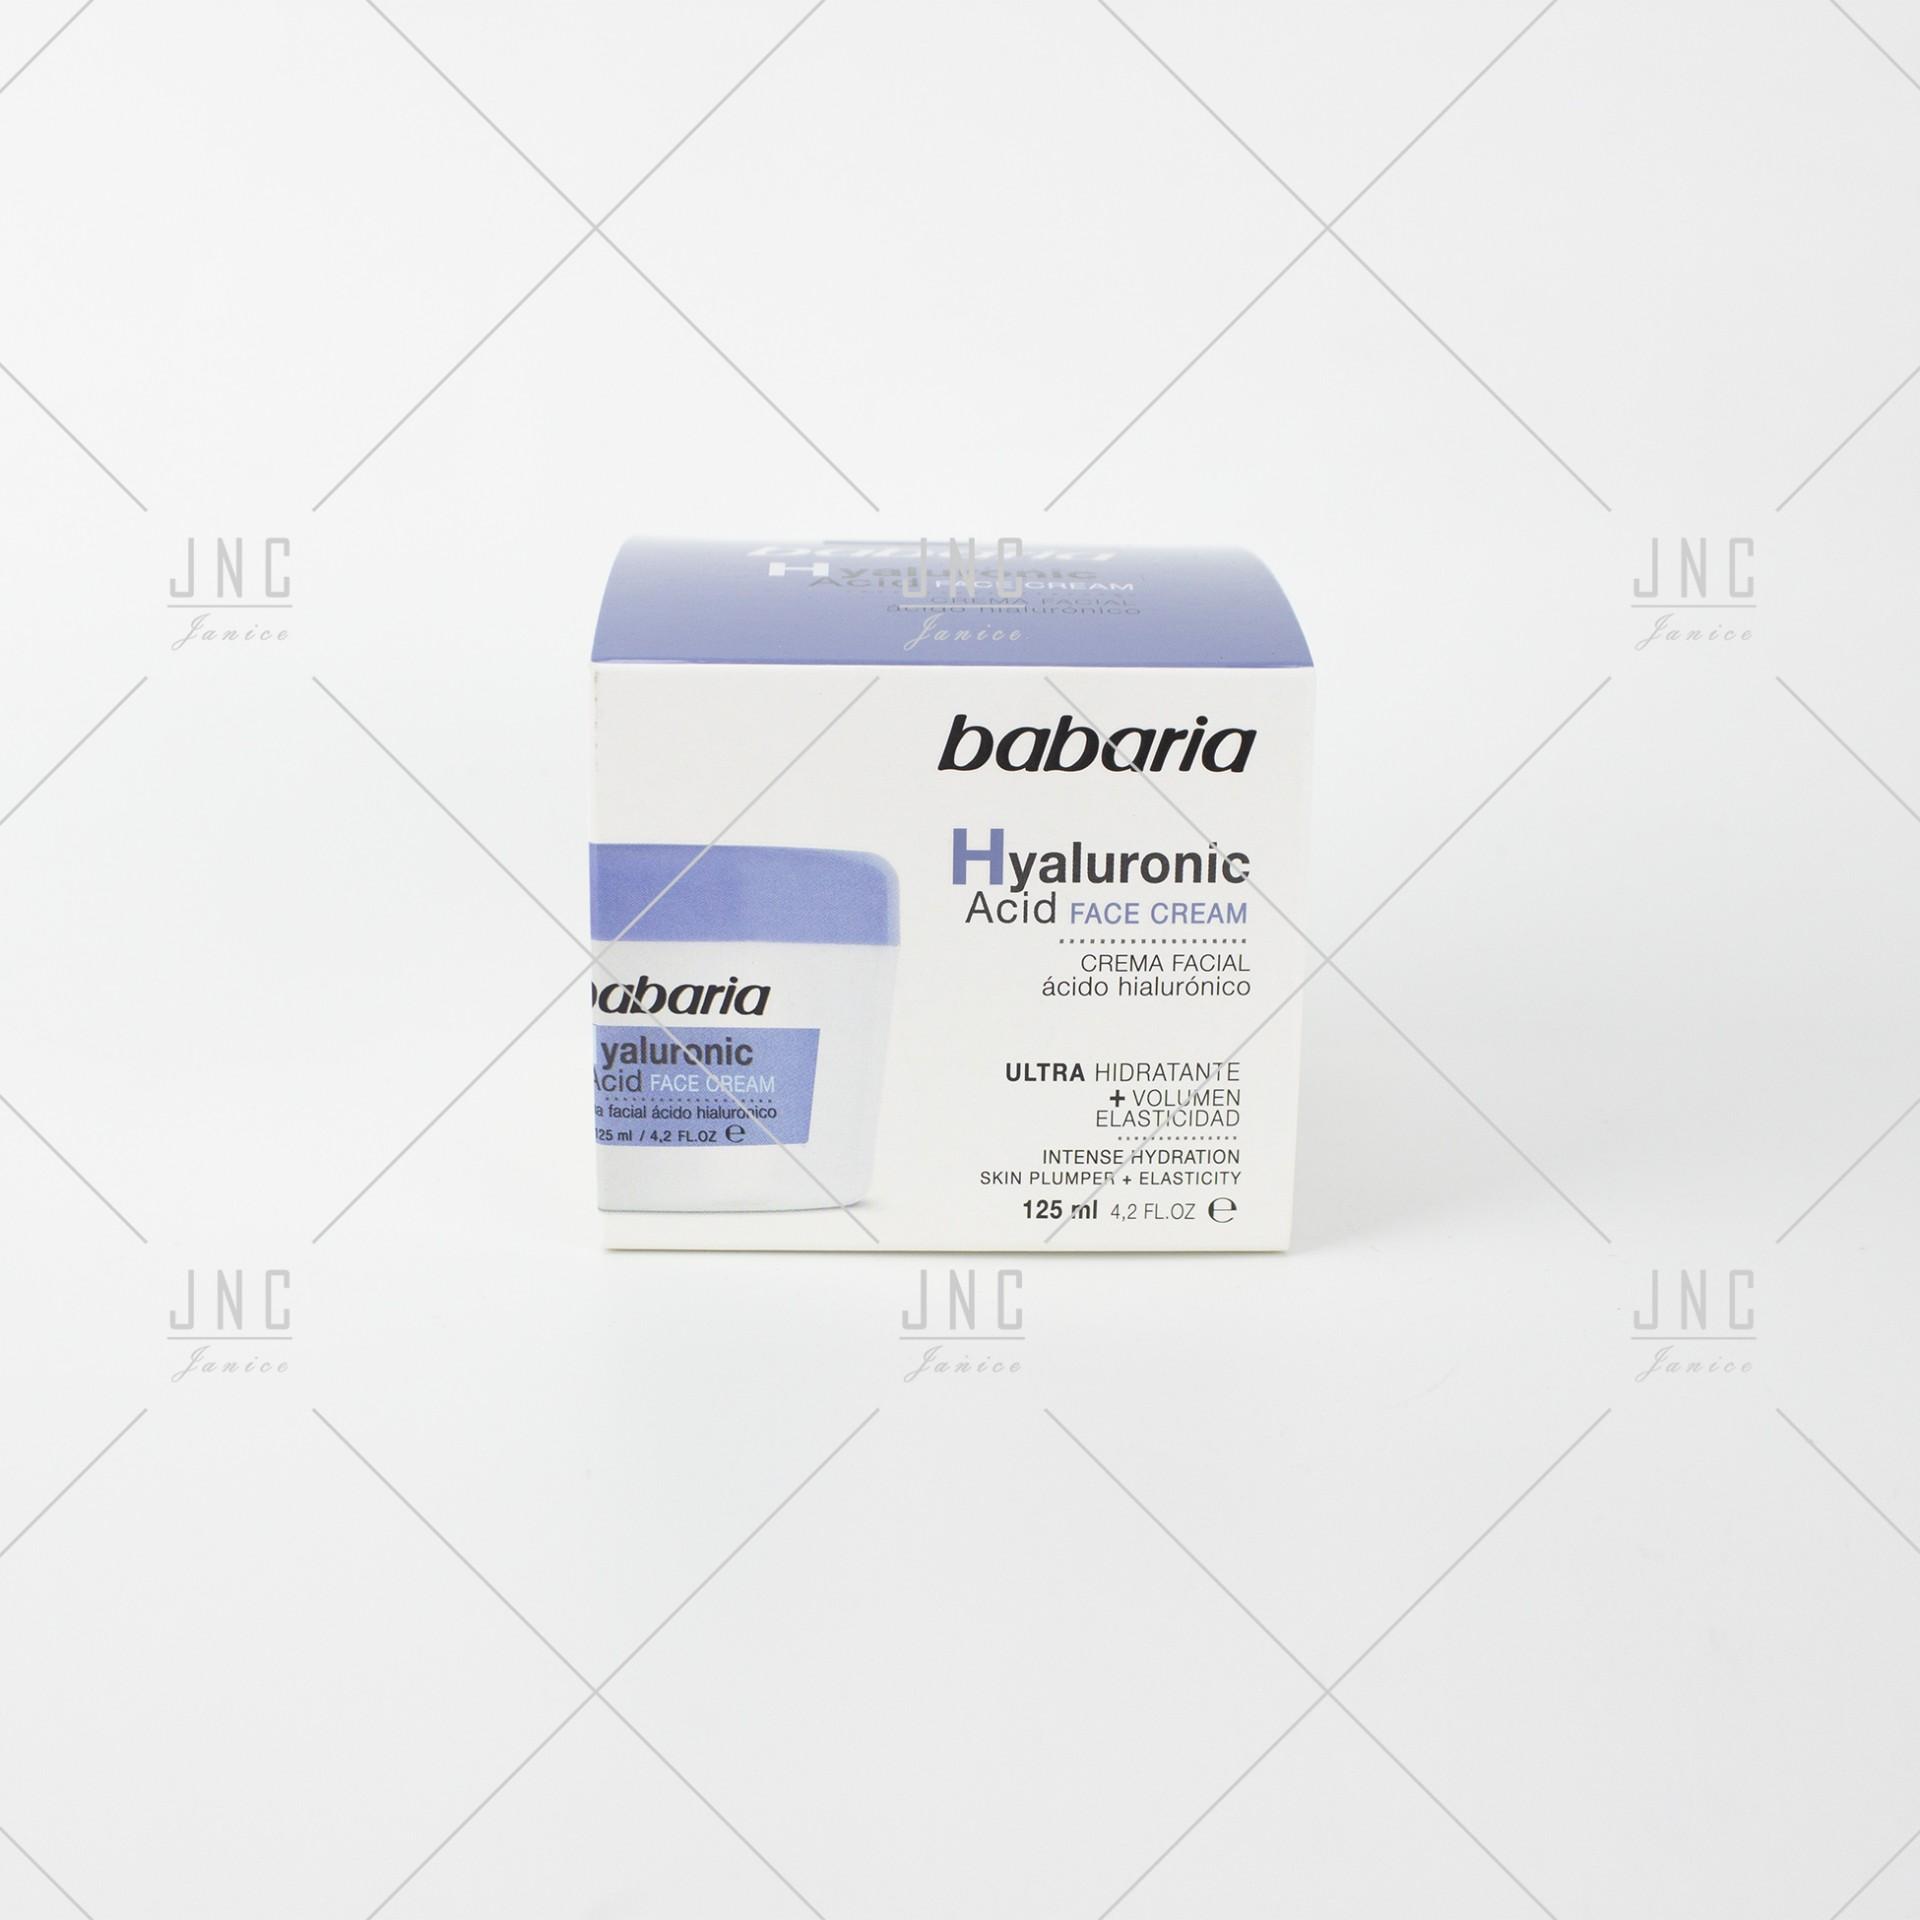 Creme Facial Hyaluronic Acid   Ref.100113